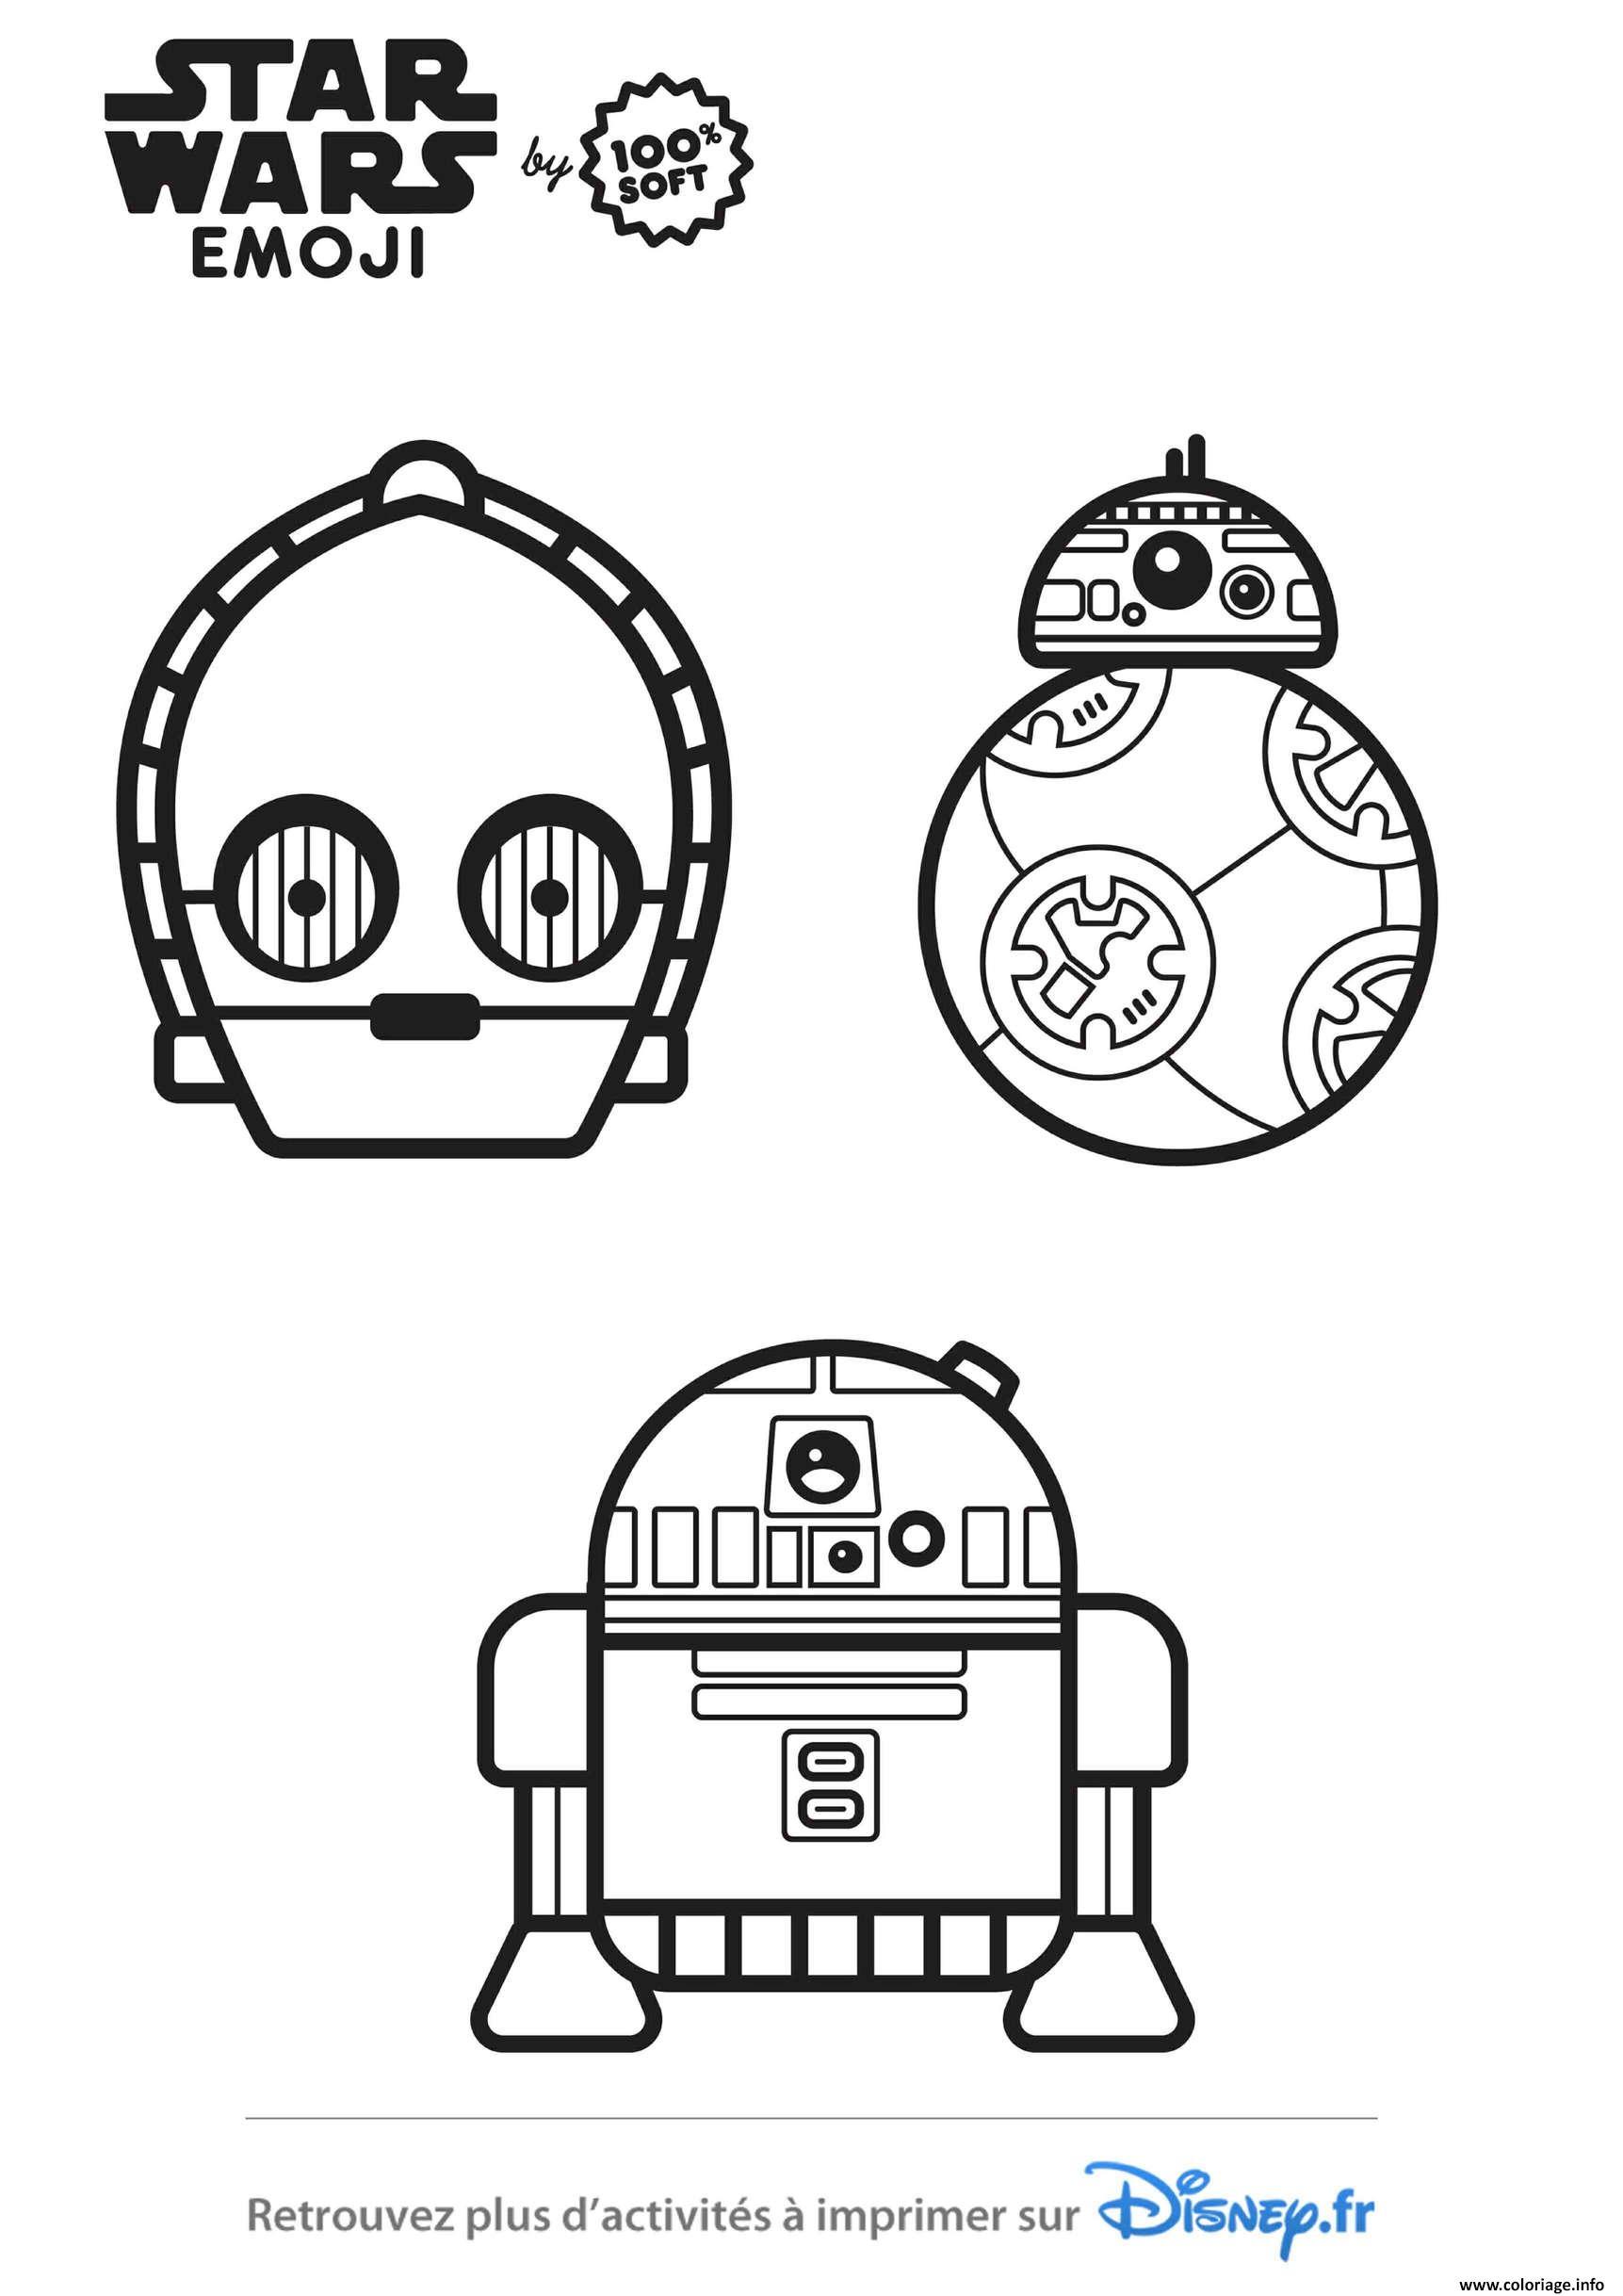 Coloriage Star Wars Personnages Emoji 2 Jecolorie Com